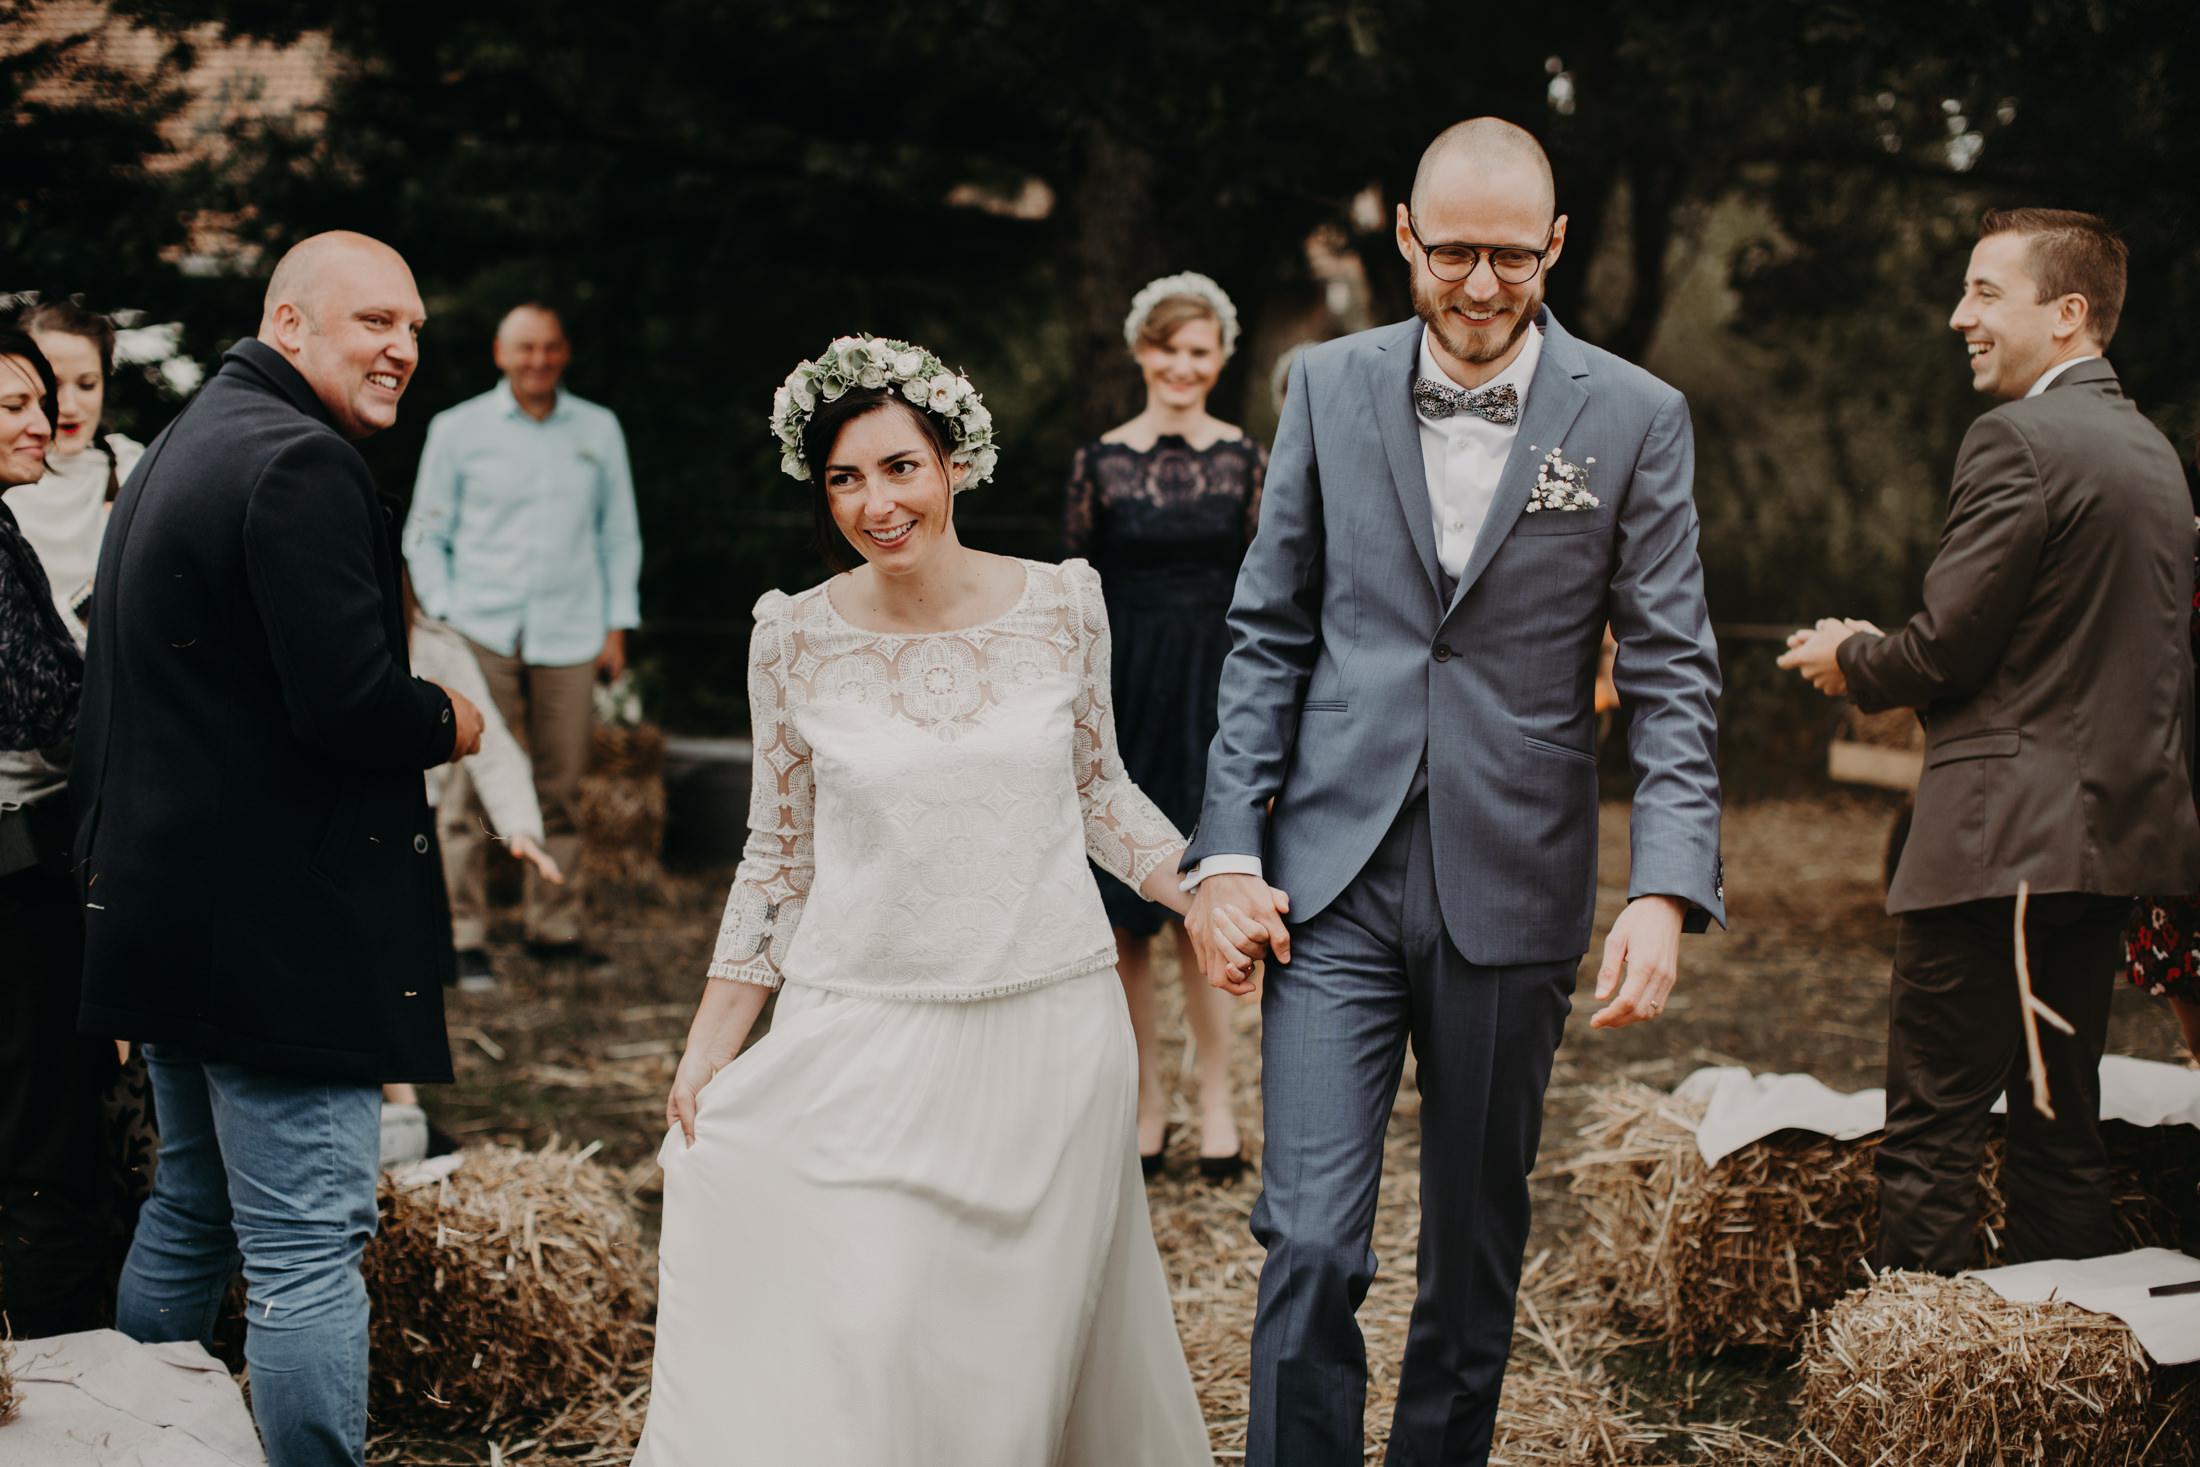 Mariage alsace germany wedding kid-48.jpg